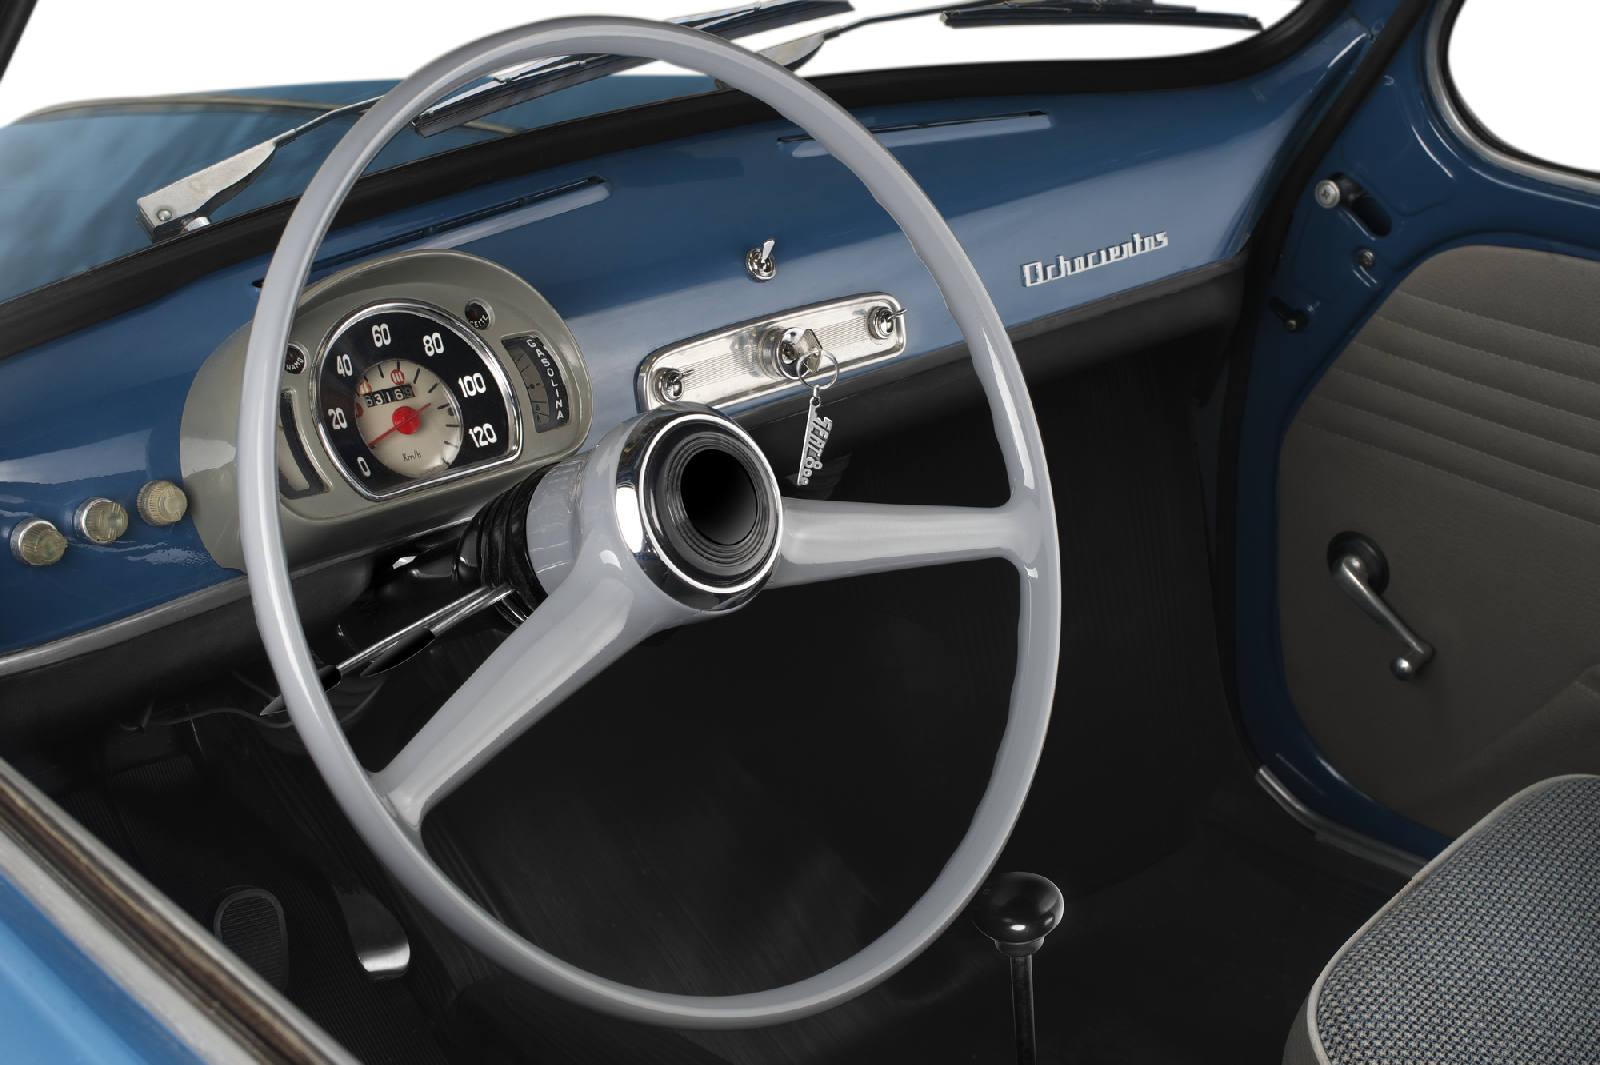 lamborghini miura vs ferrari with 86030 on Aventador moreover Gt500 Mustang Ford Shelby Eleanor 1967 6c89330f3388a125 likewise Printthread as well Lamborghini besides Lamborghini 1.